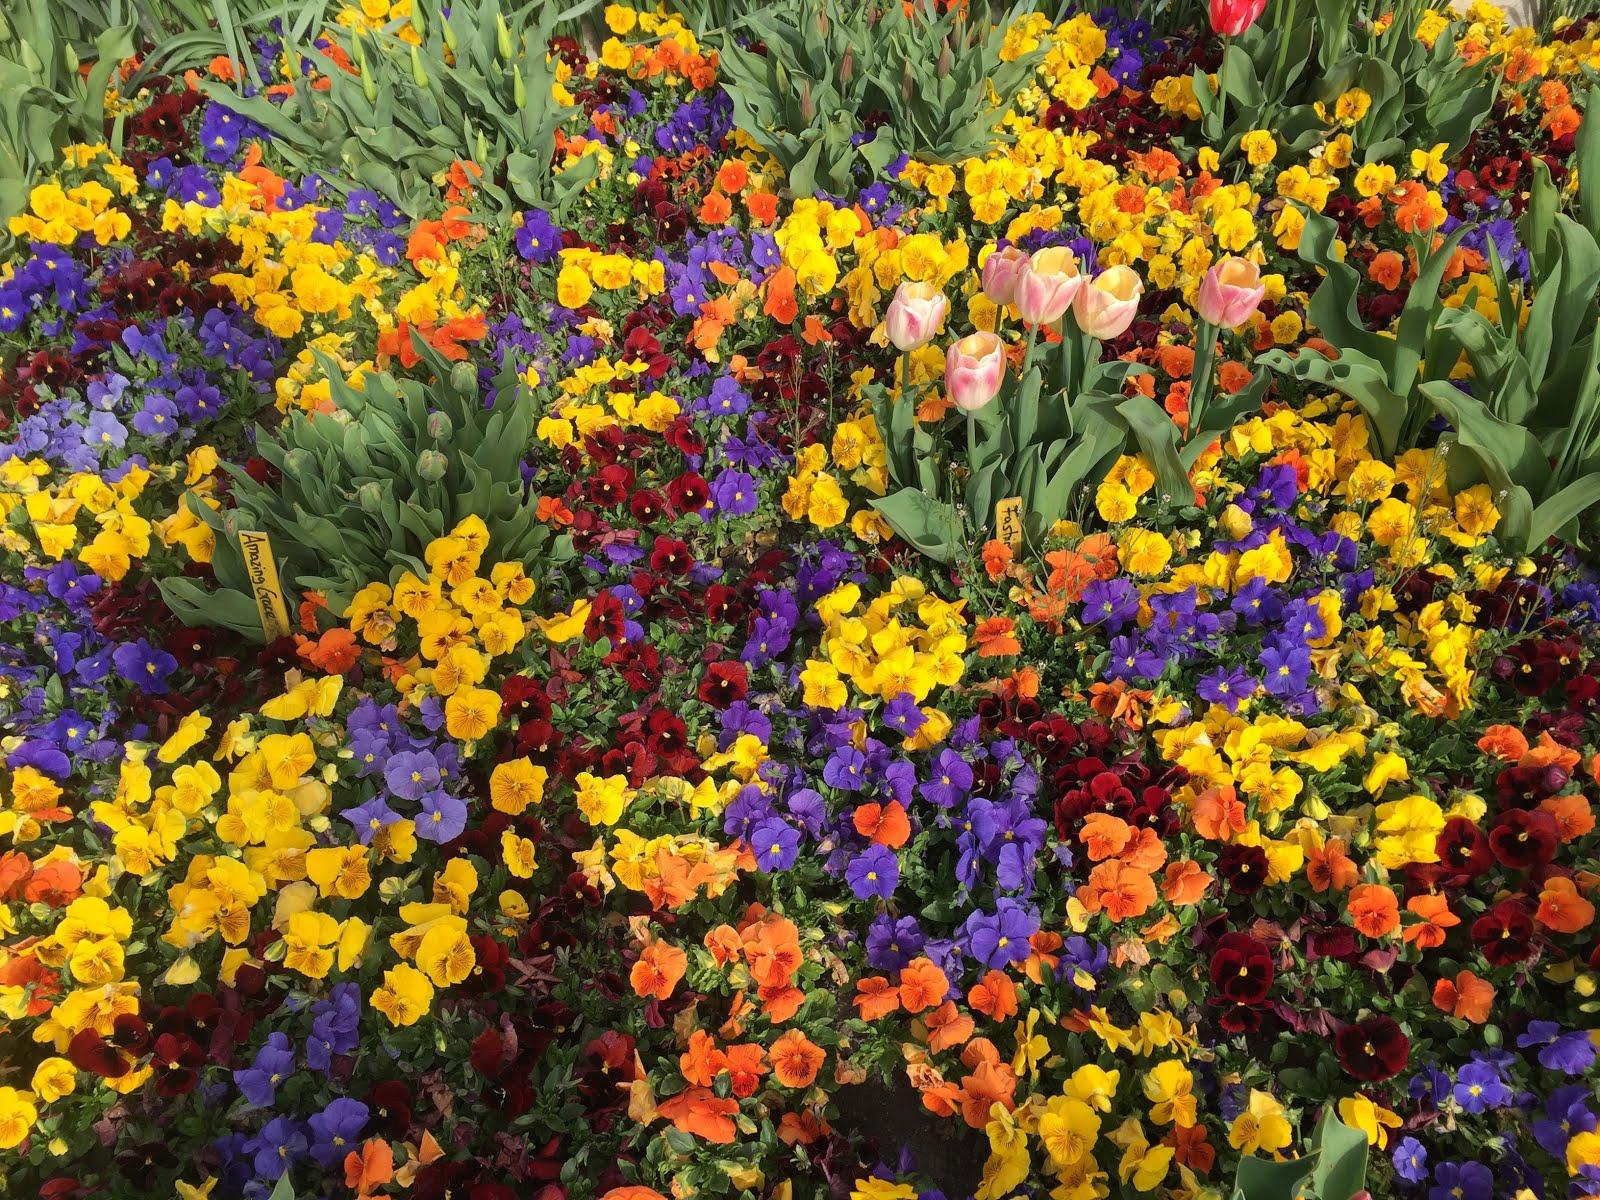 Blumenpracht '18